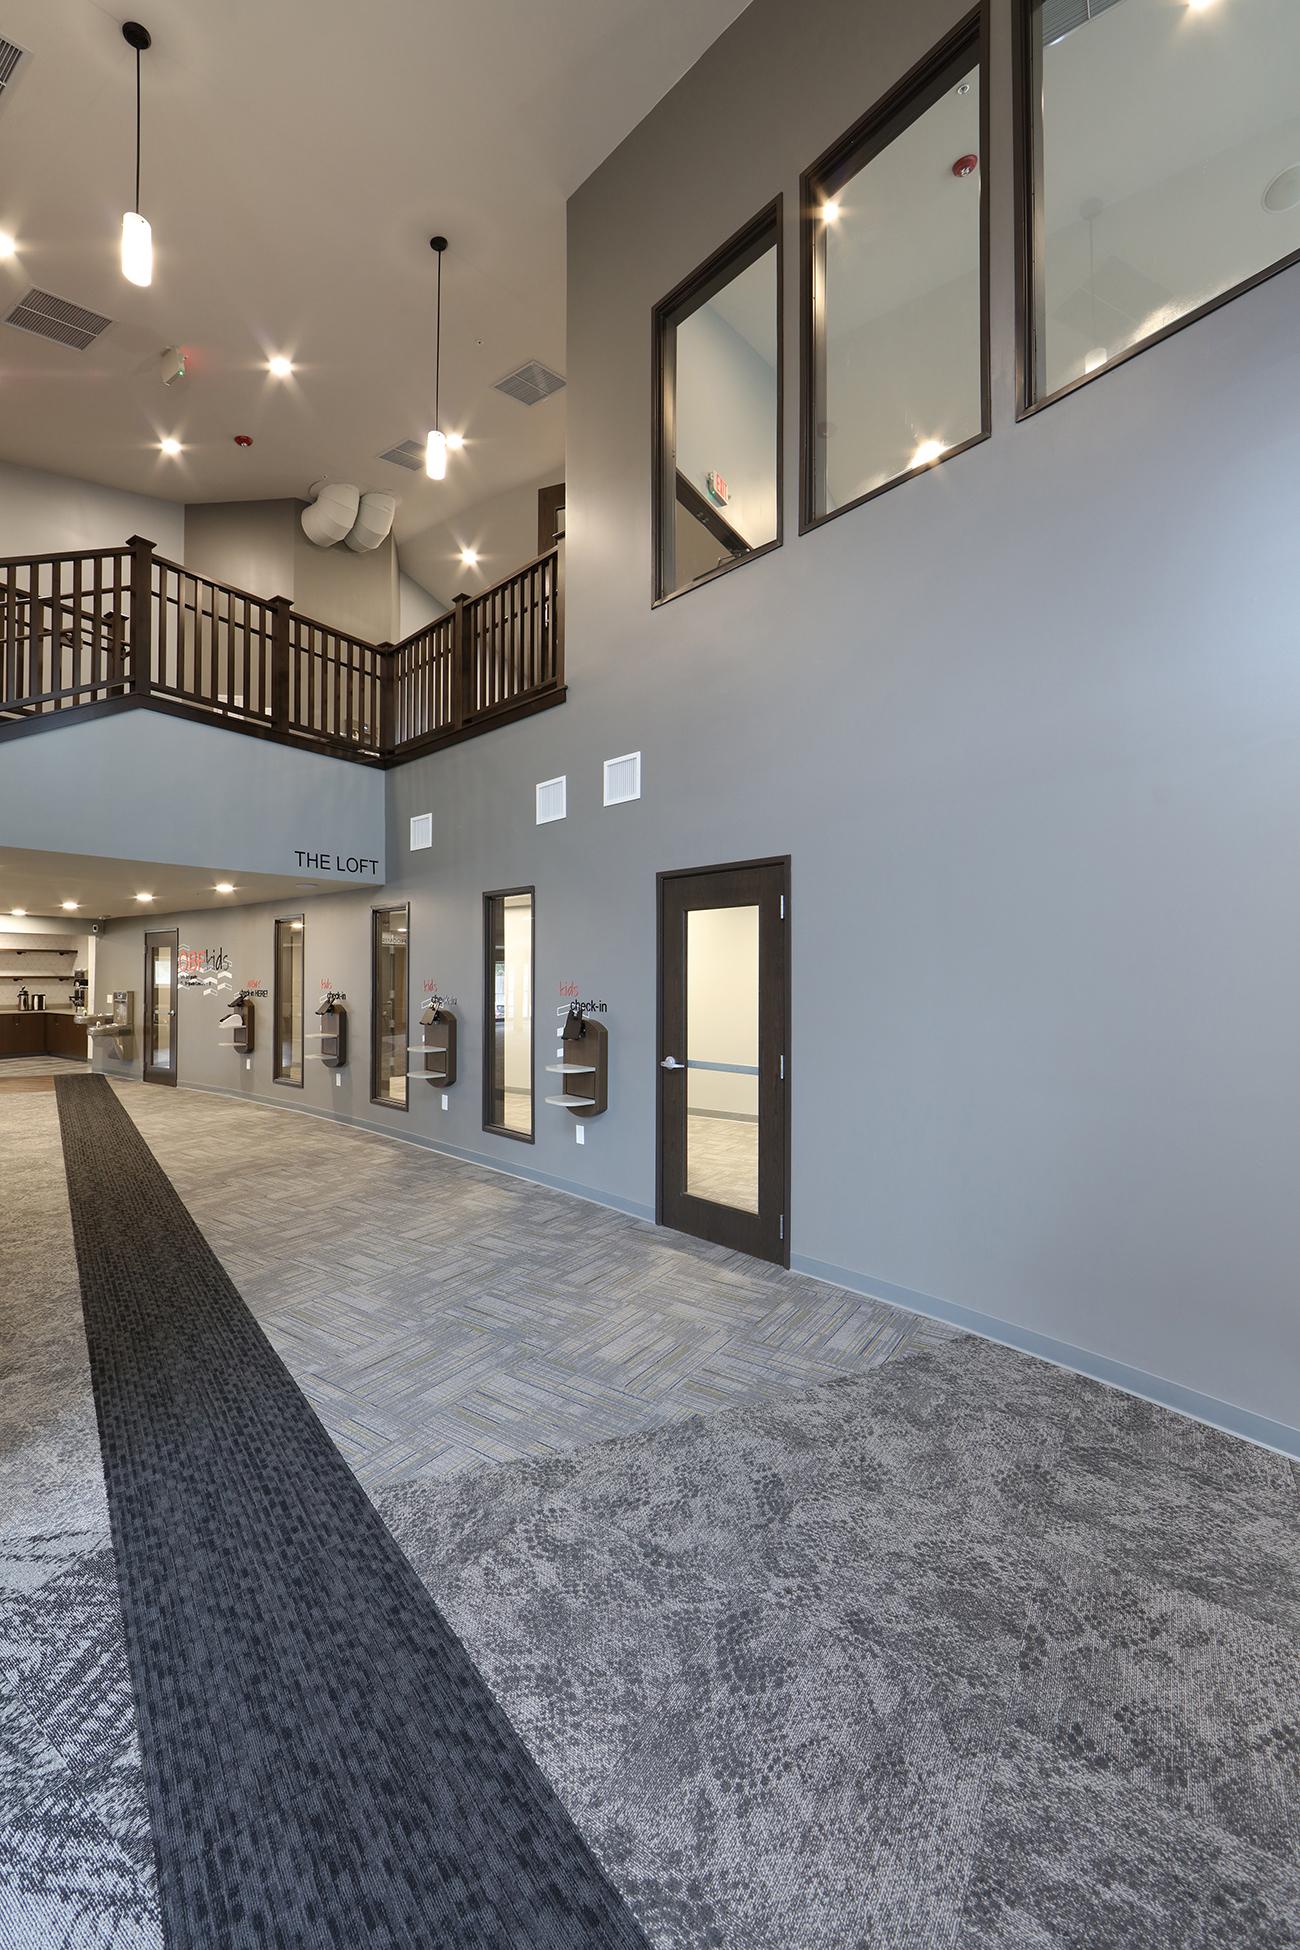 oxford-bible-hallway-stairway